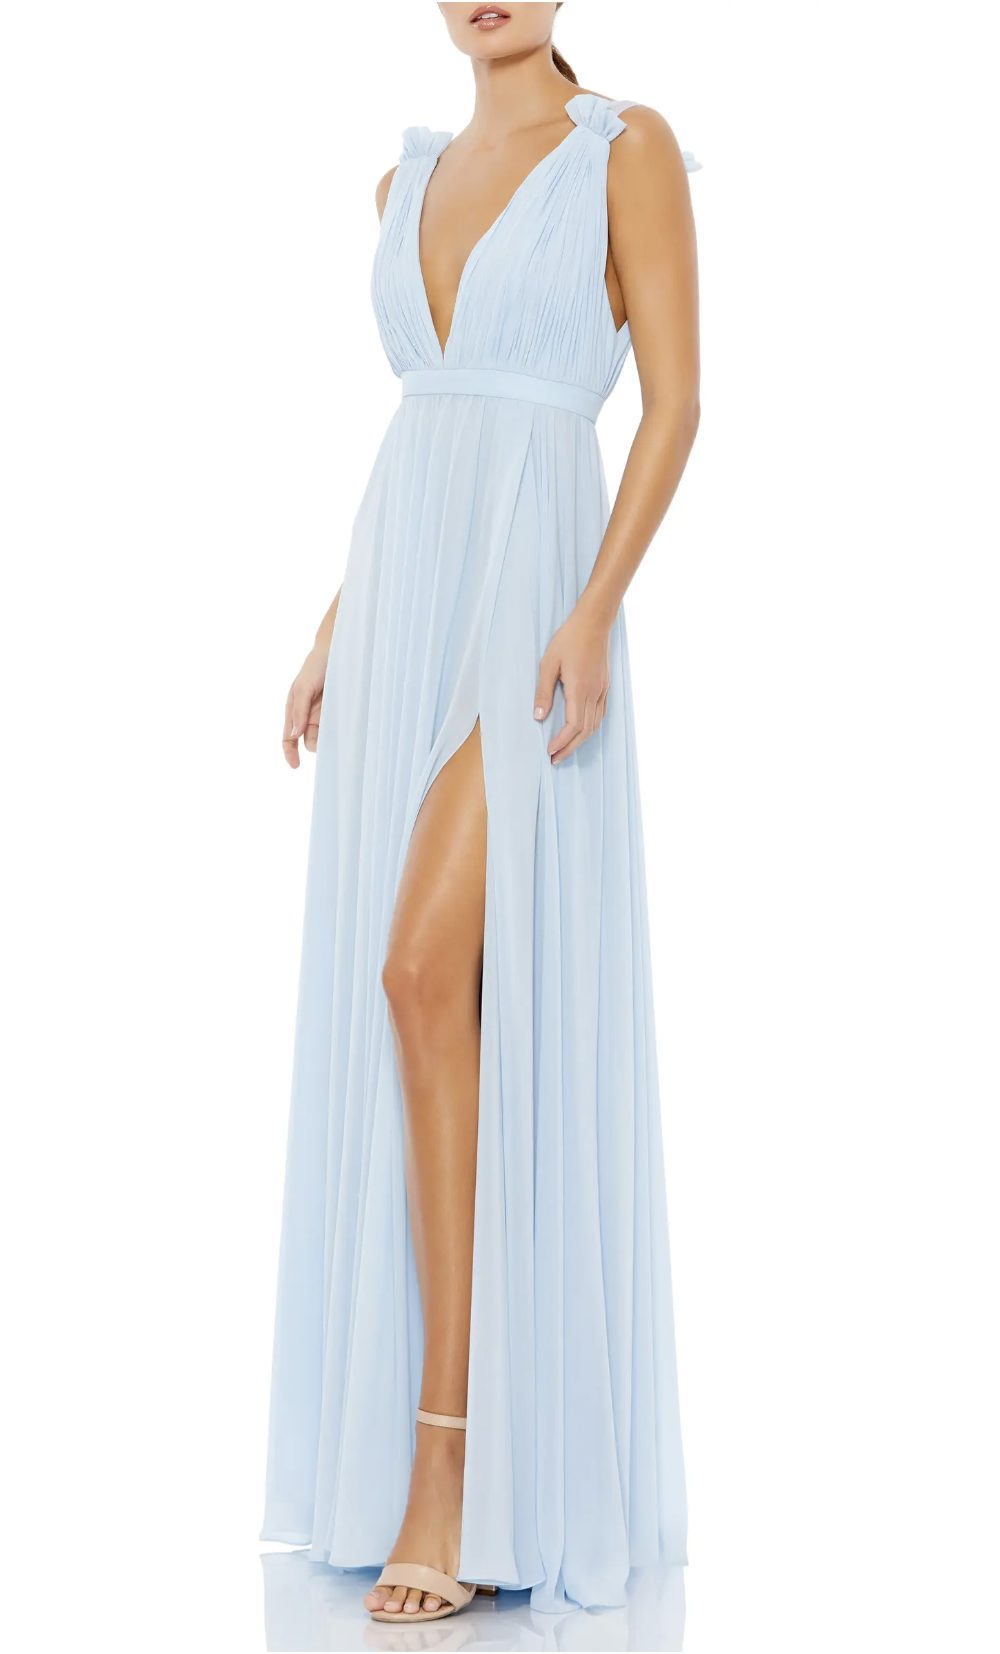 Light blue long prom dress with split